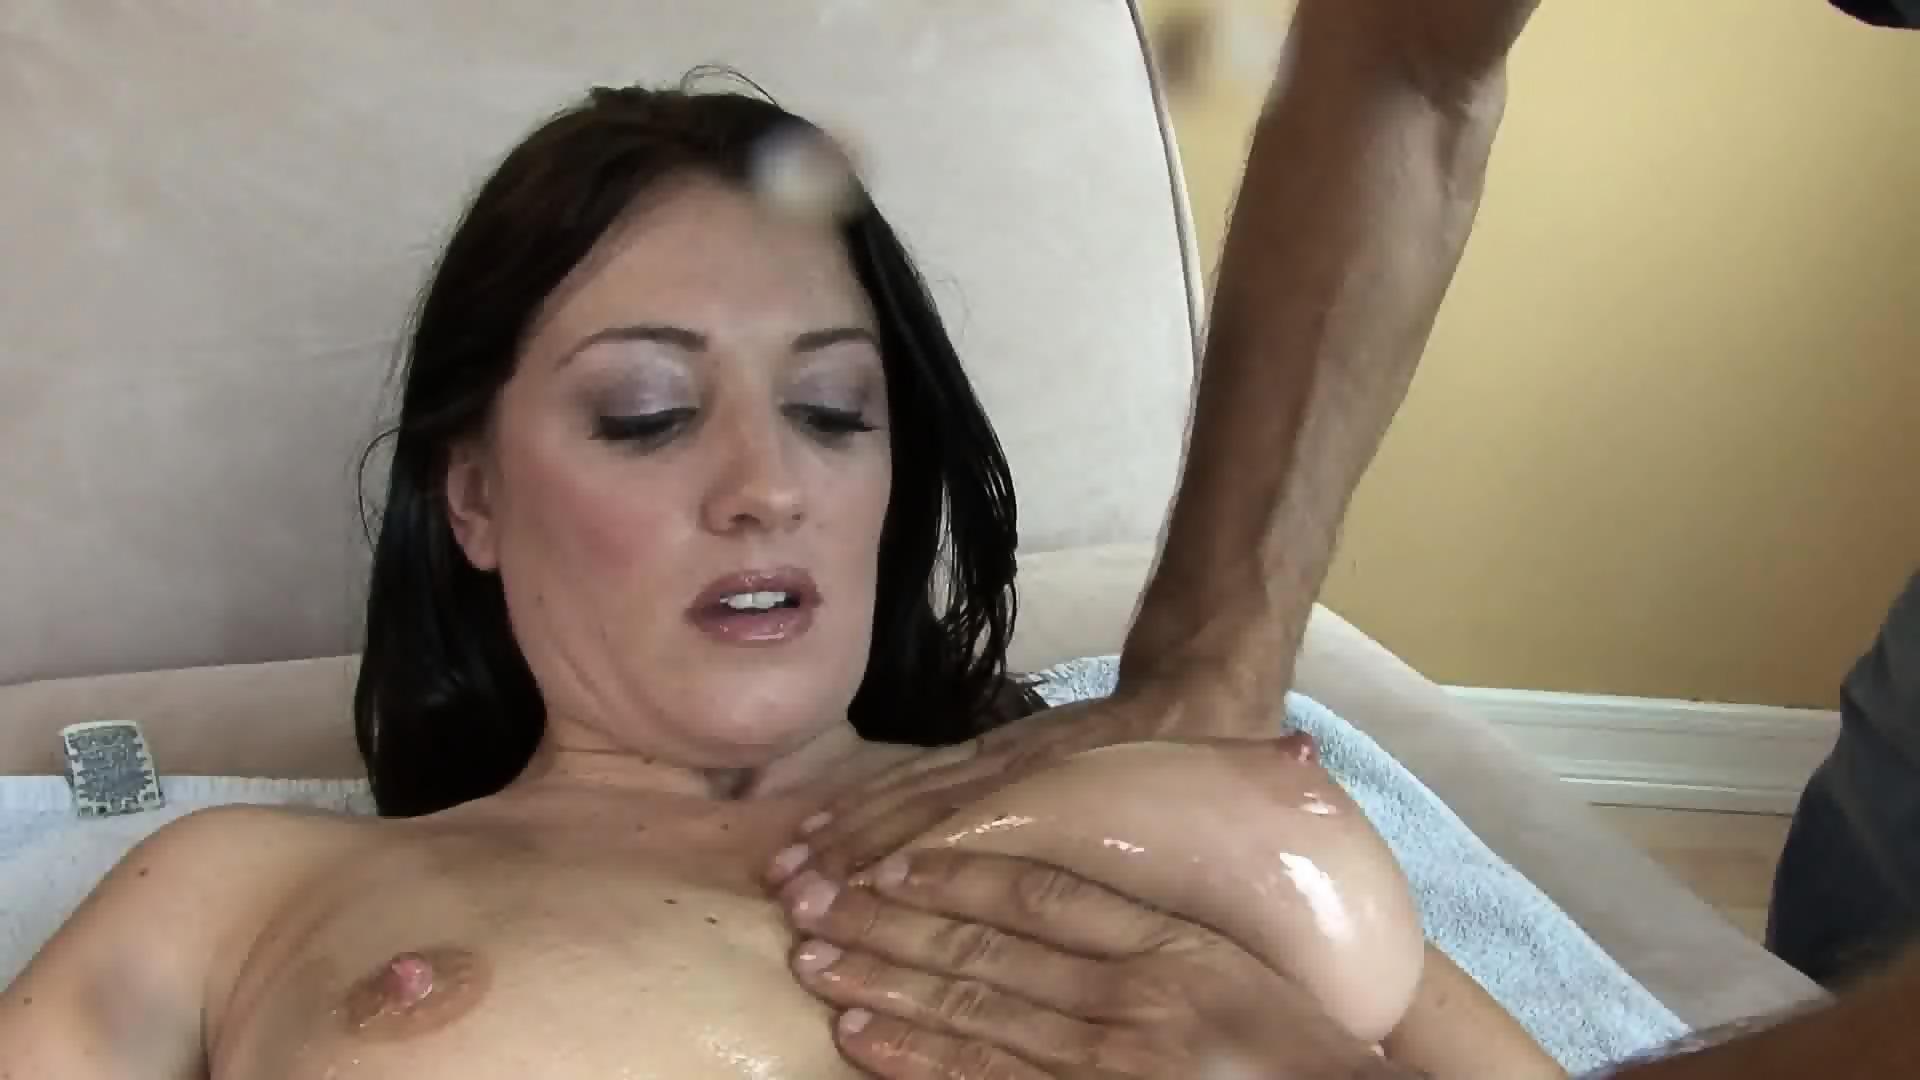 Fantastic sex scene